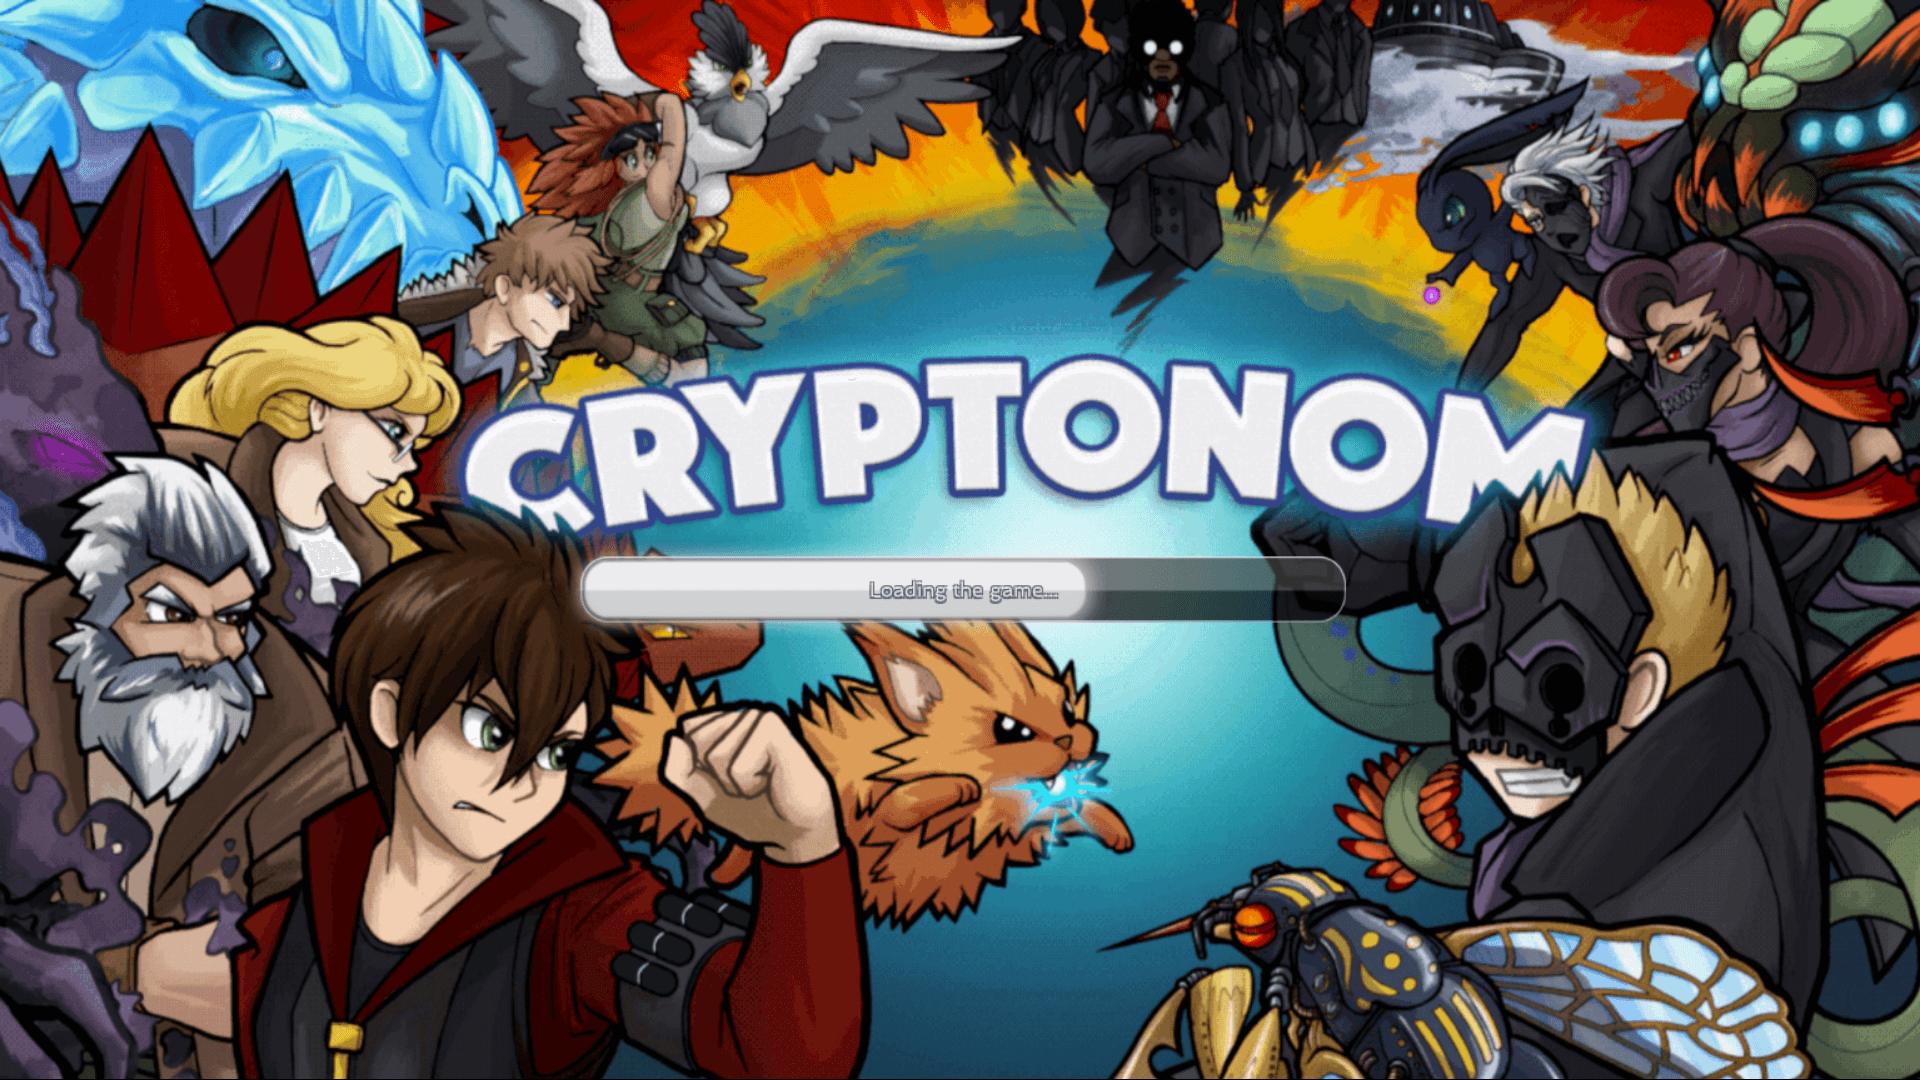 Cryptonom Public Demo v2 Launch